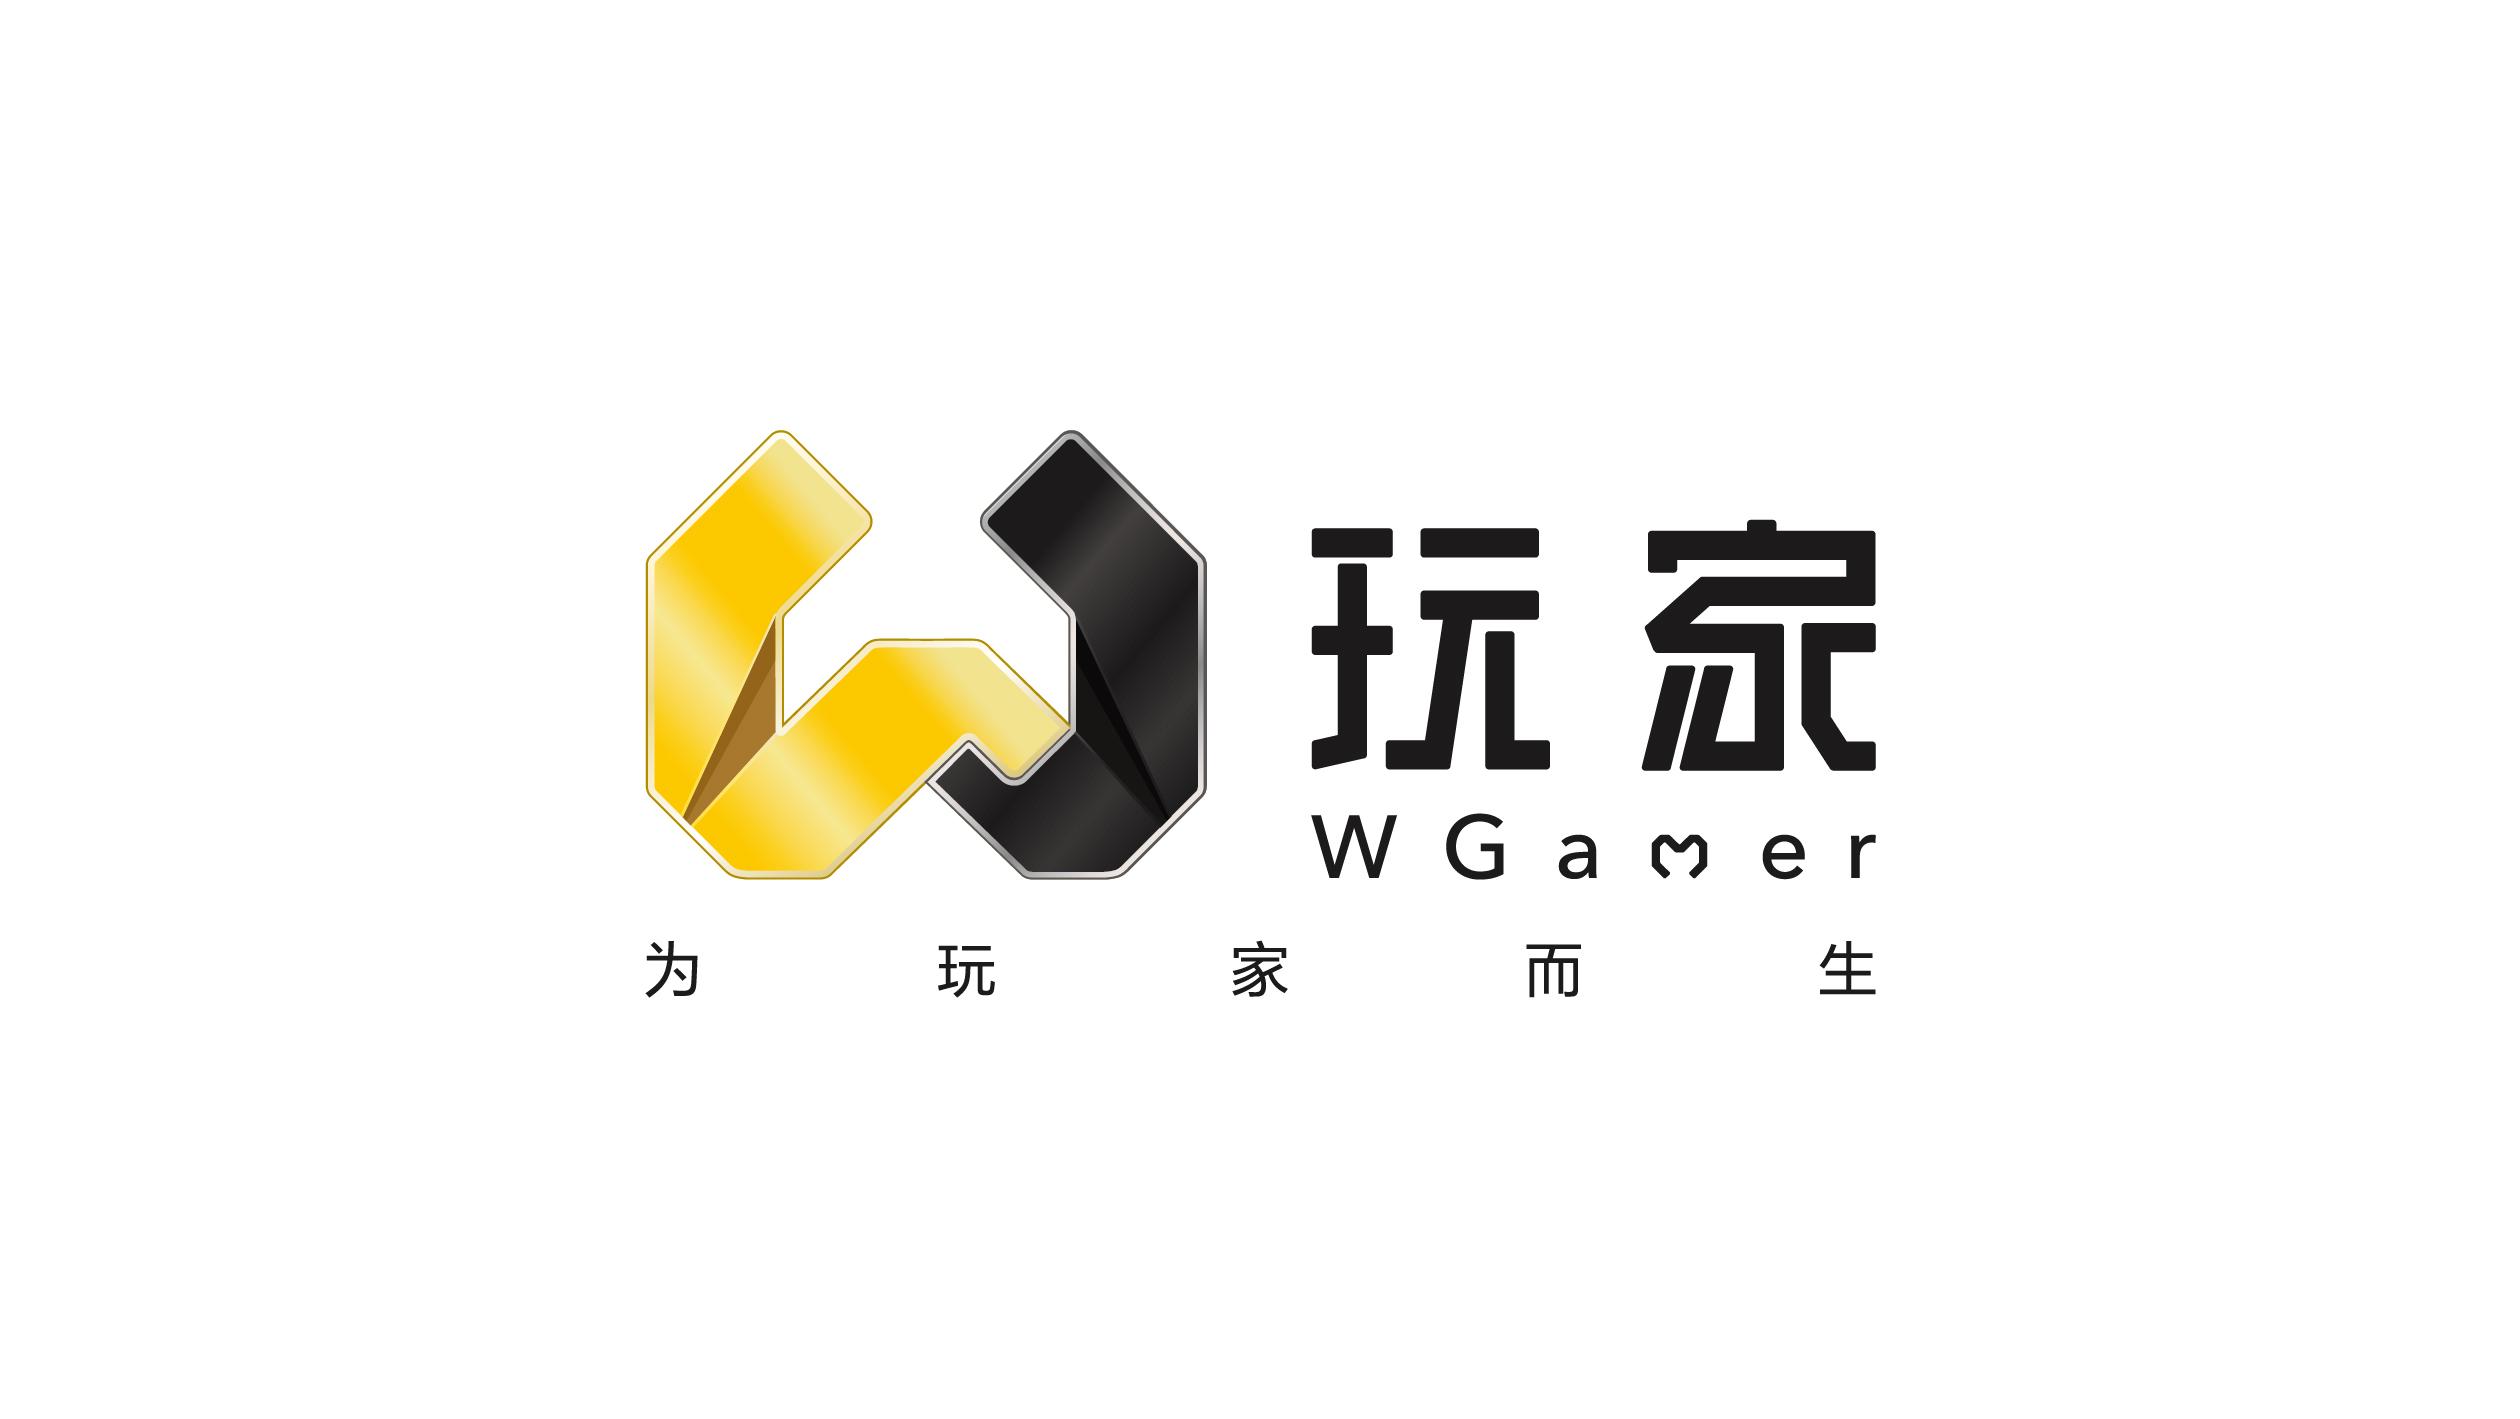 WGamer